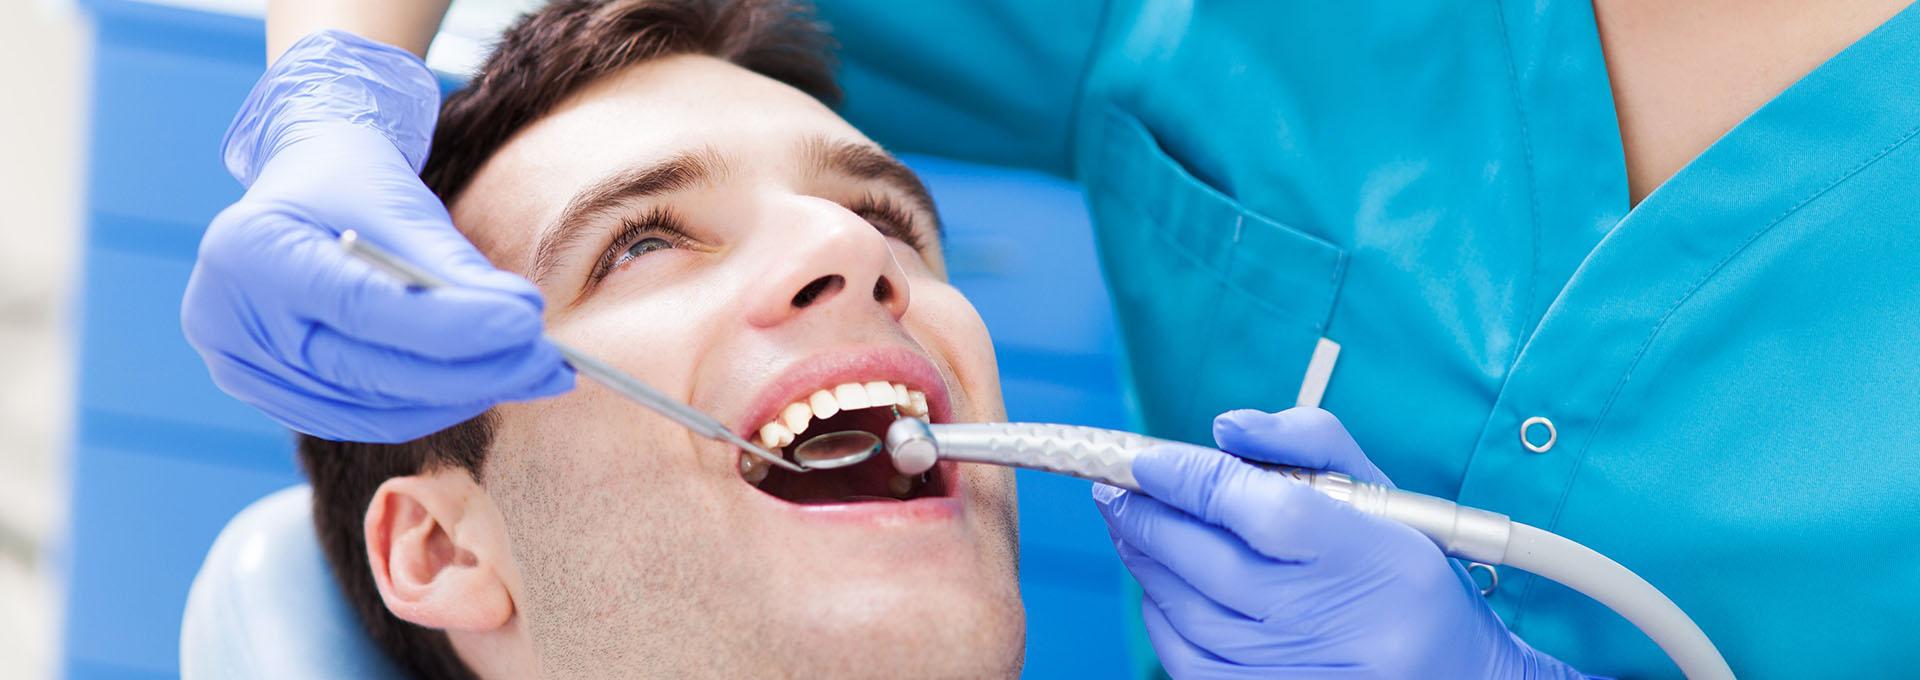 Supplemental Dental Plans - A Good Option